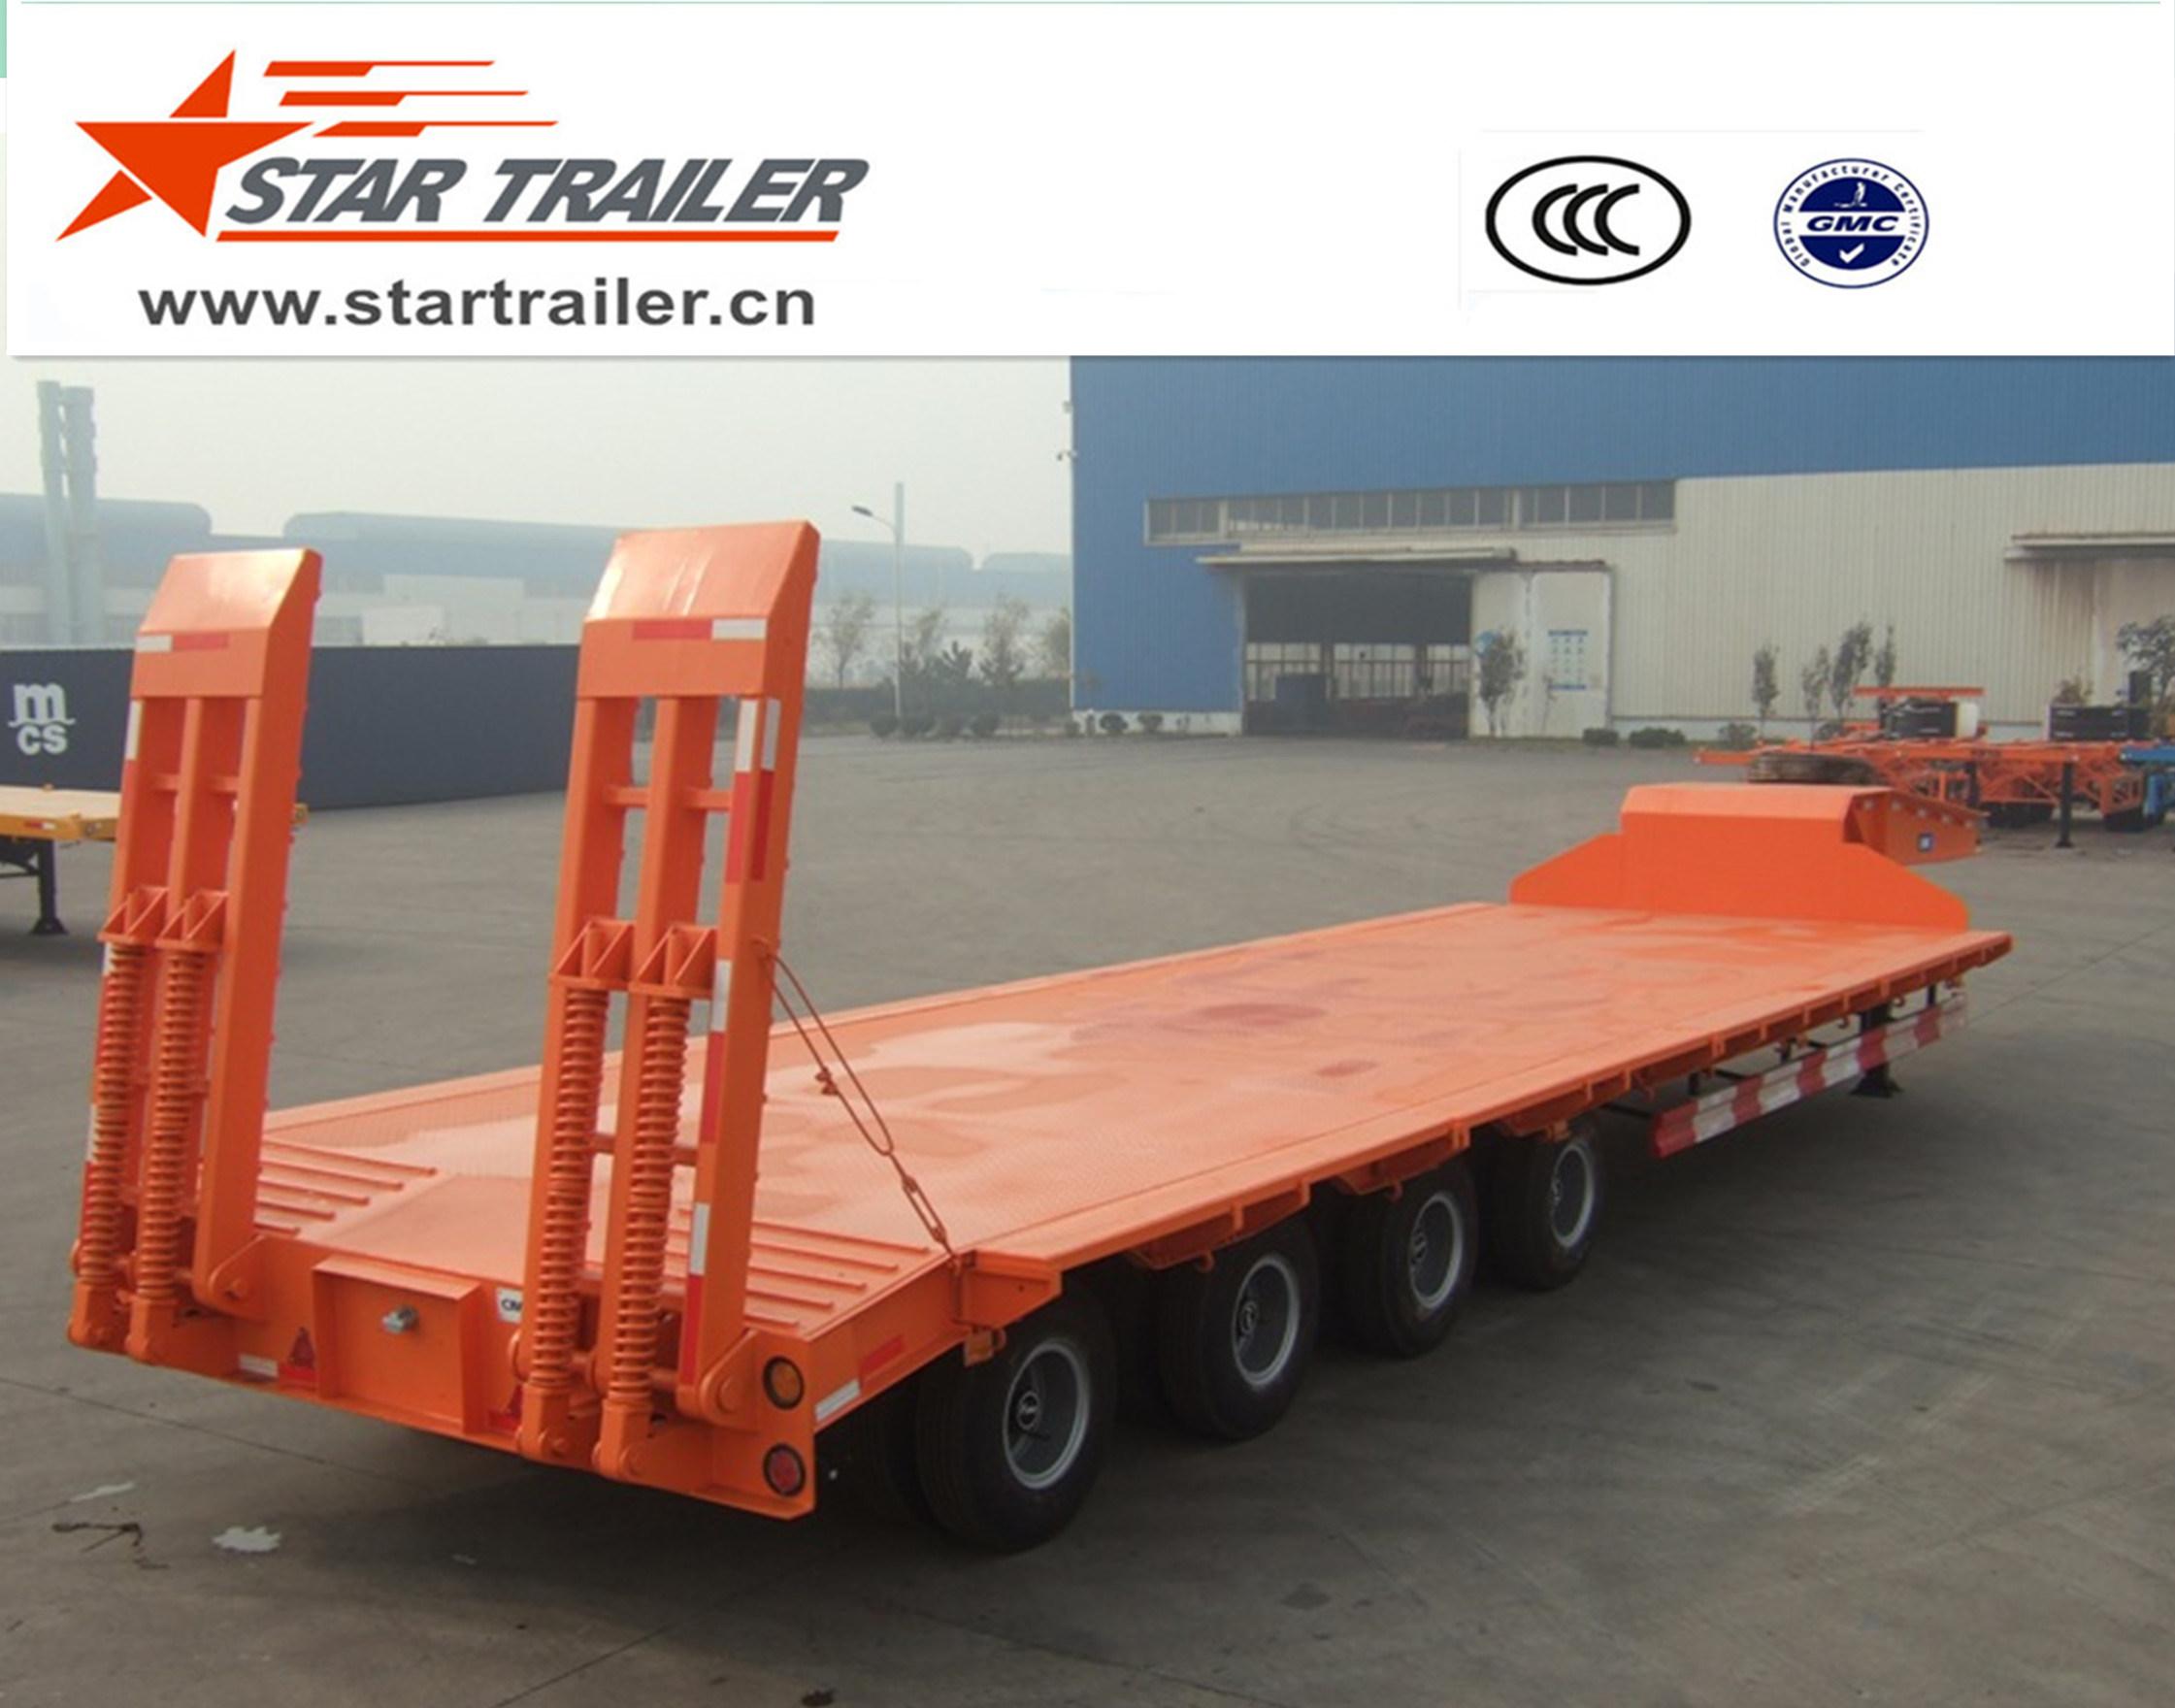 4 Axles Heavy Equipment Transport Low Bed Trailer